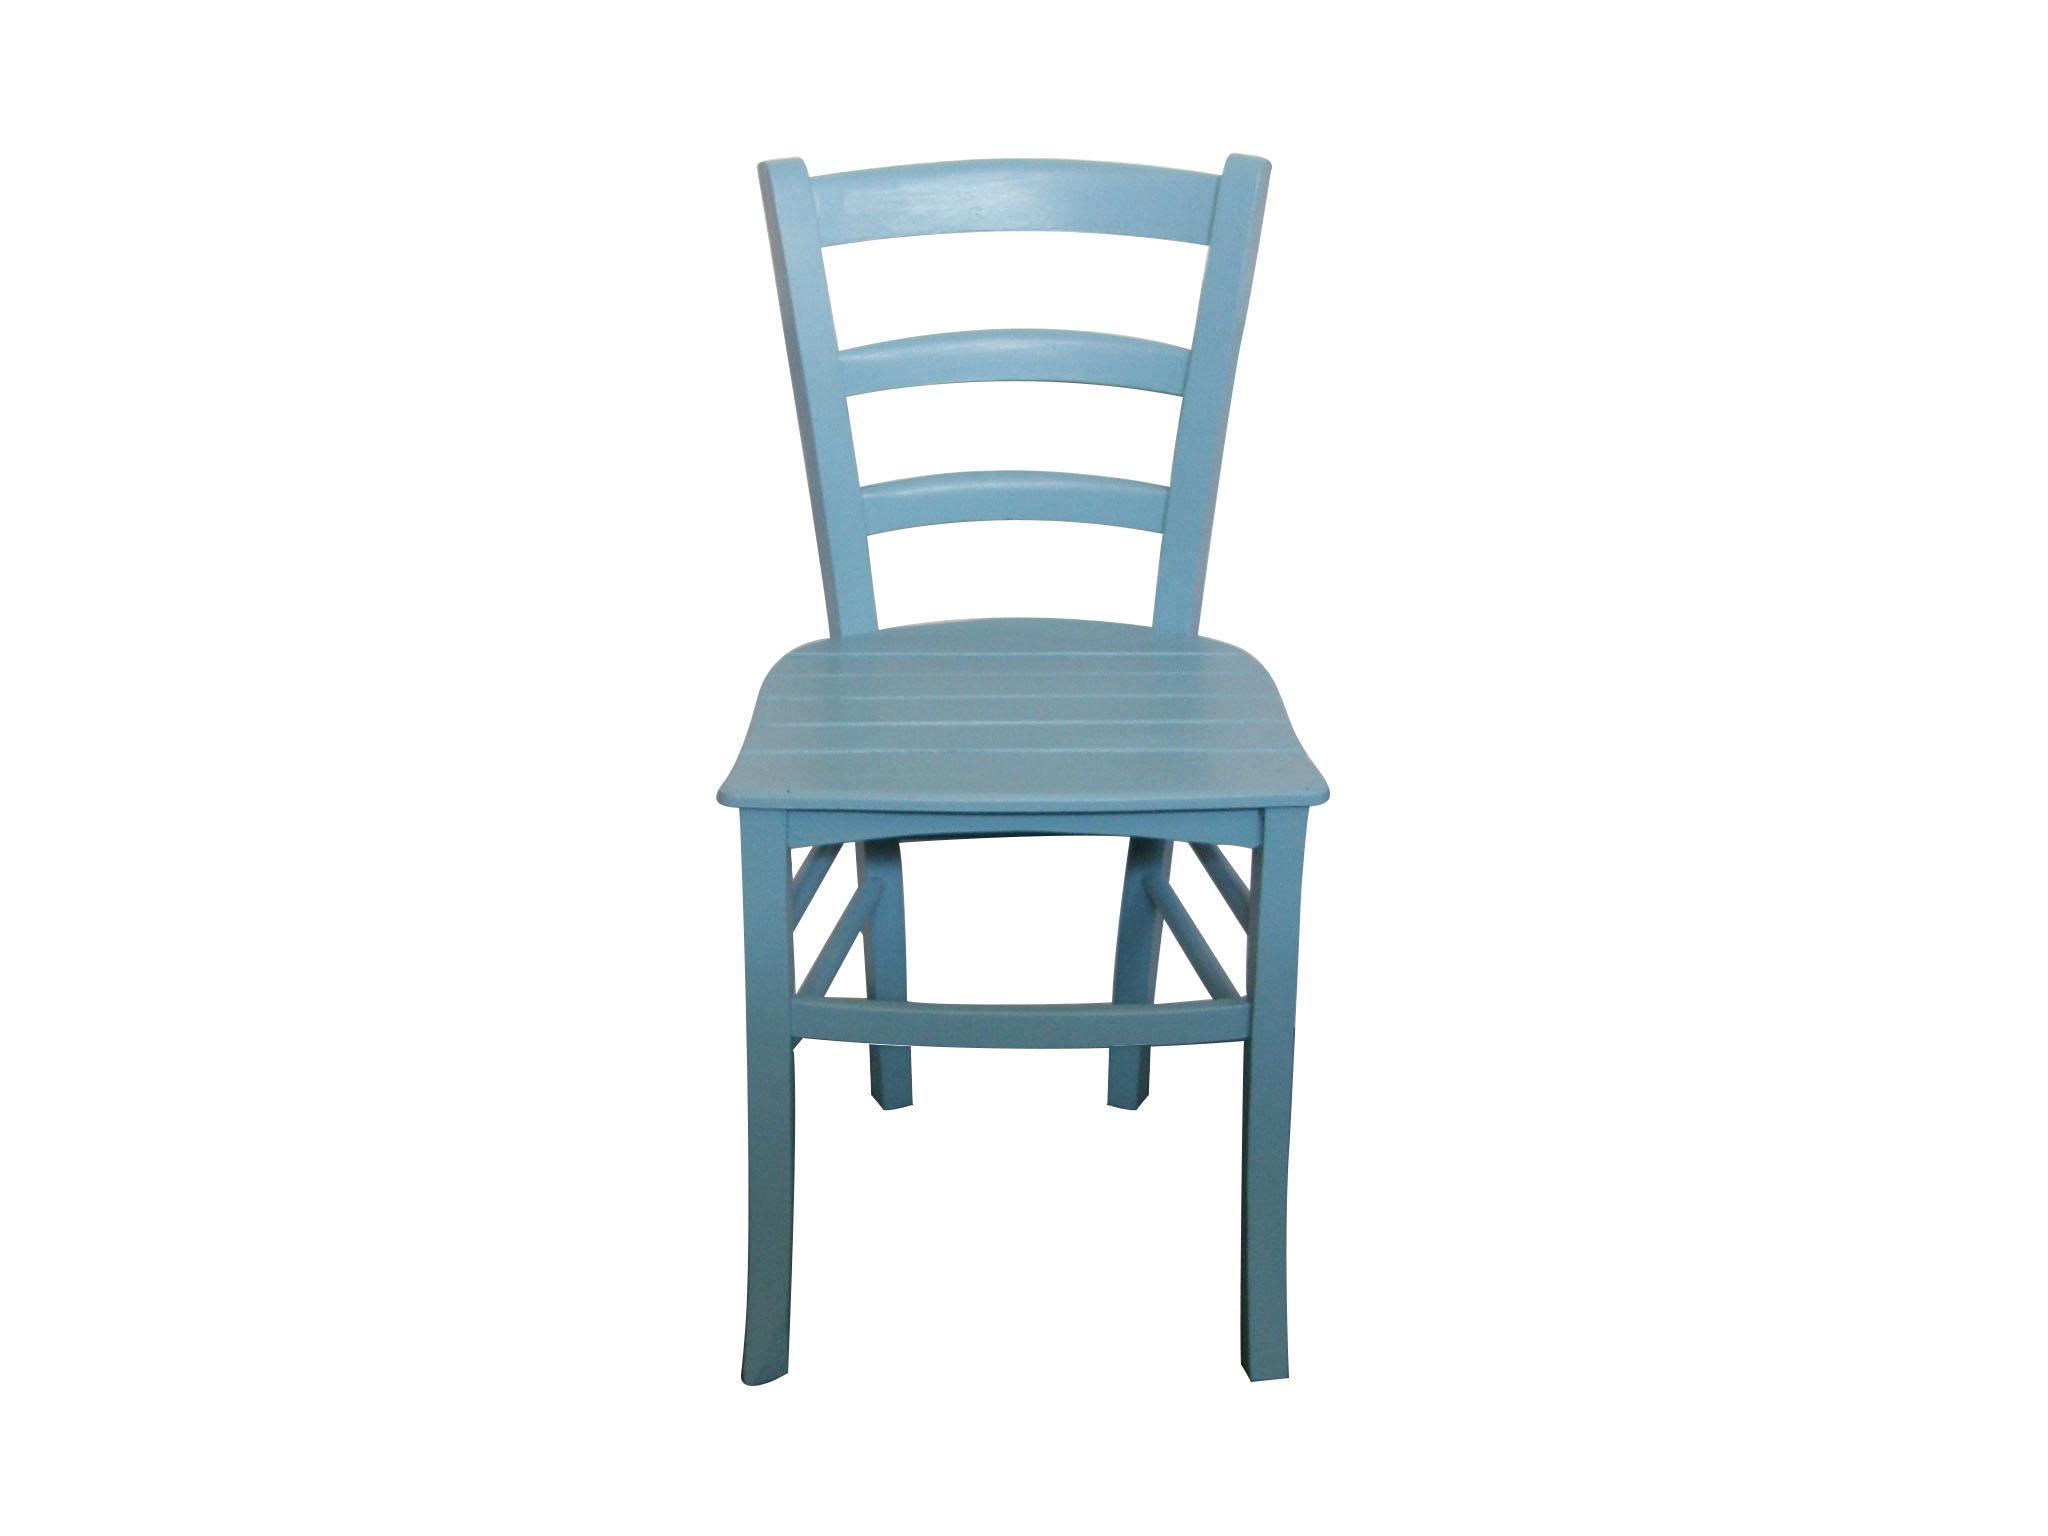 Sedia in legno azzurra decapè telovendoio